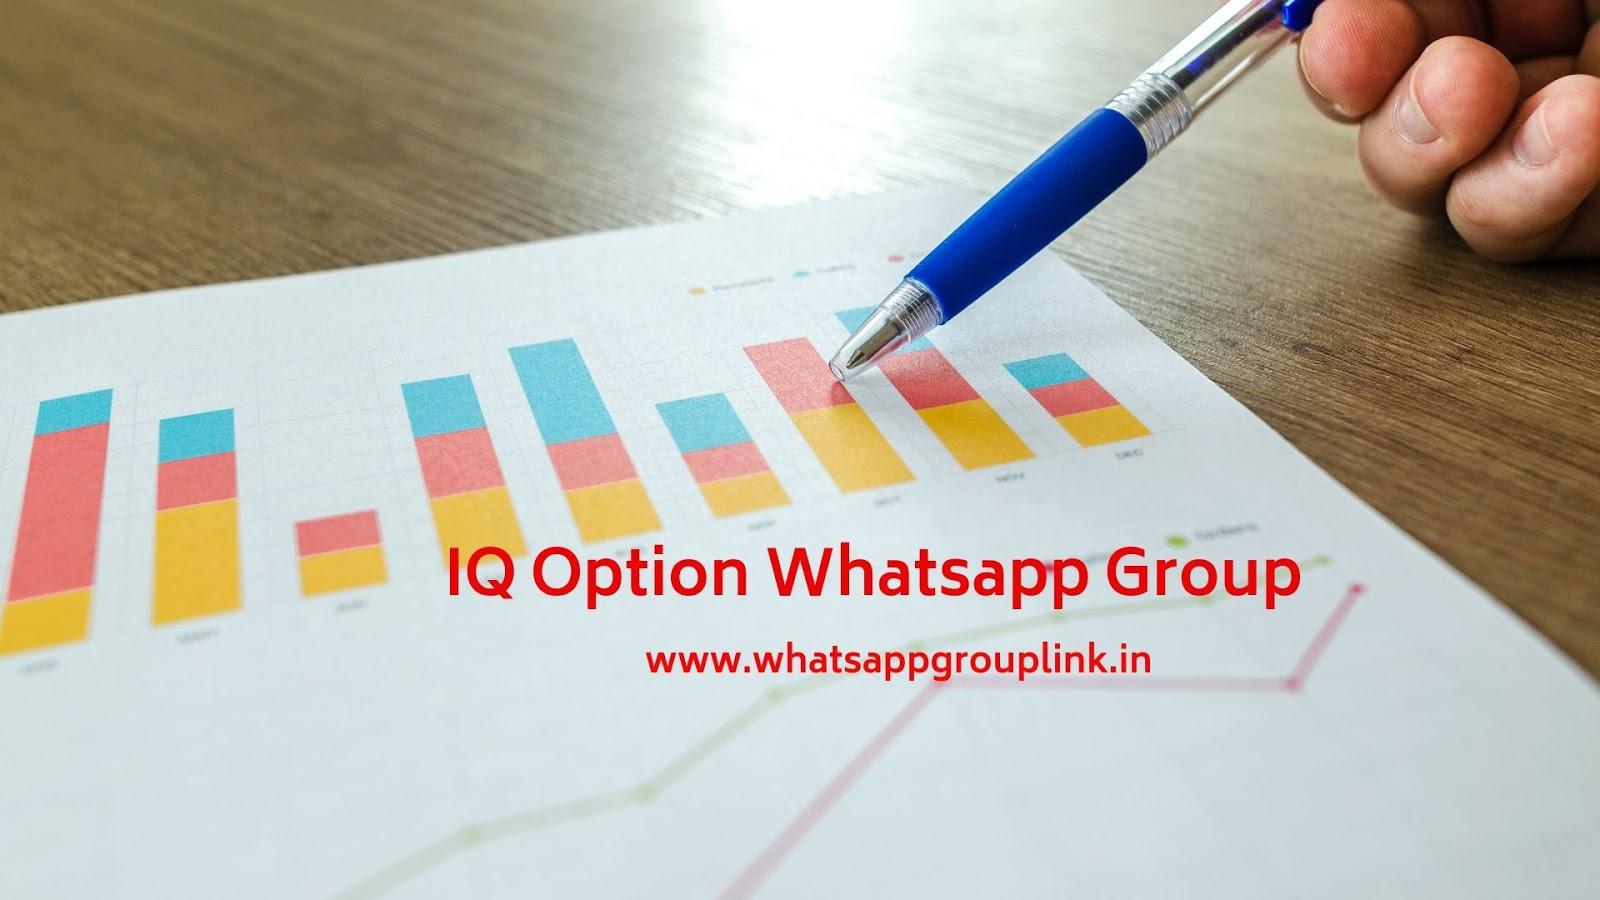 Whatsapp Group Link: IQ Option Whatsapp Group